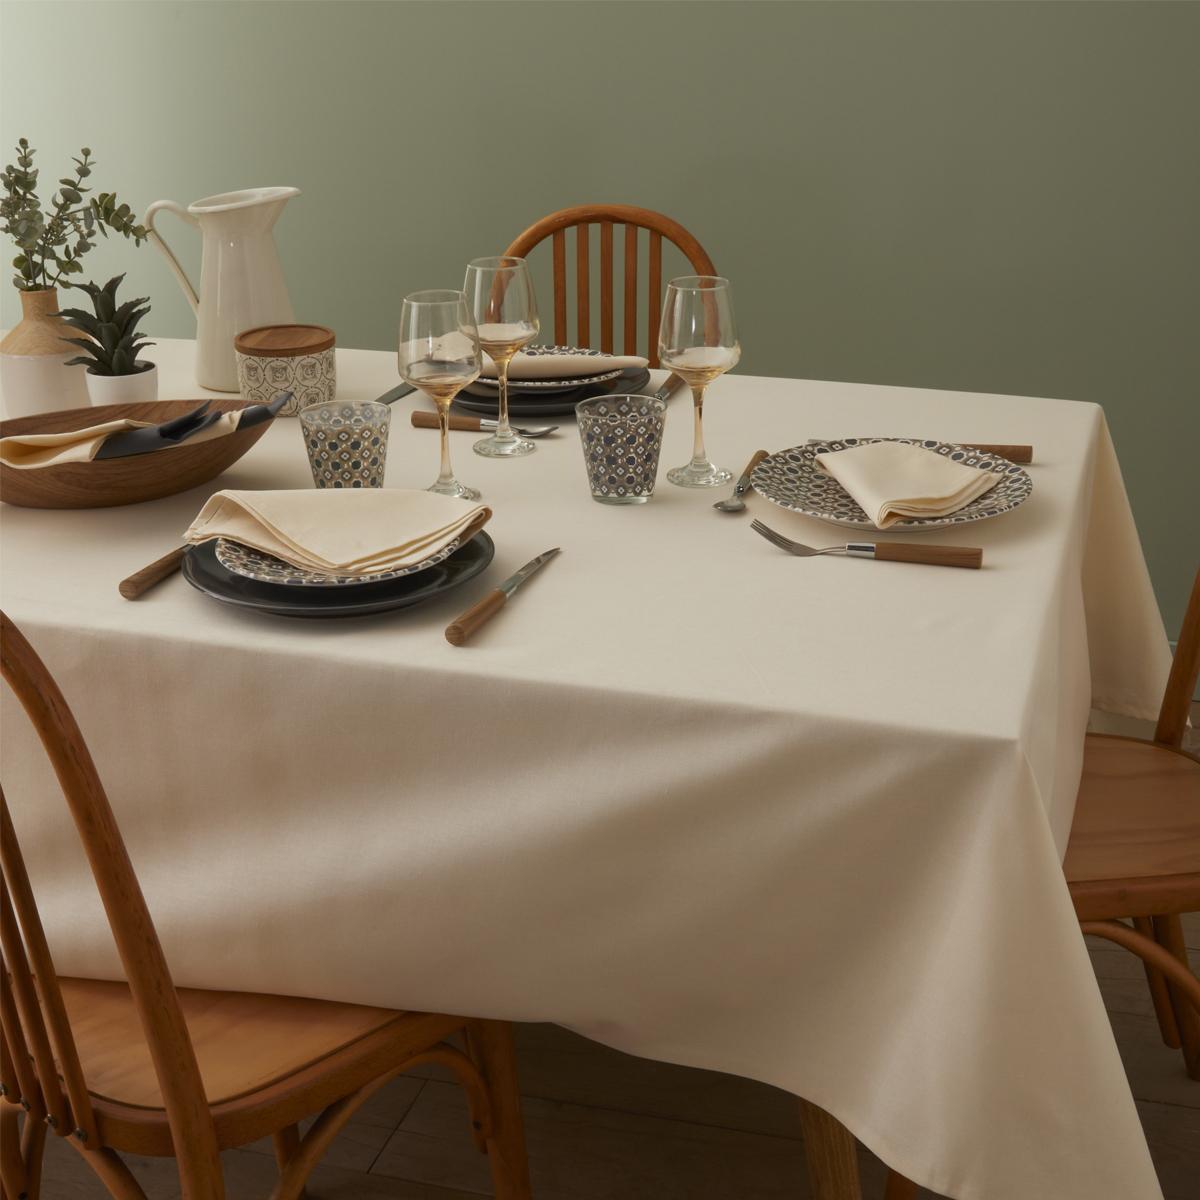 Nappe en coton traitee teflon creme 180 x 300